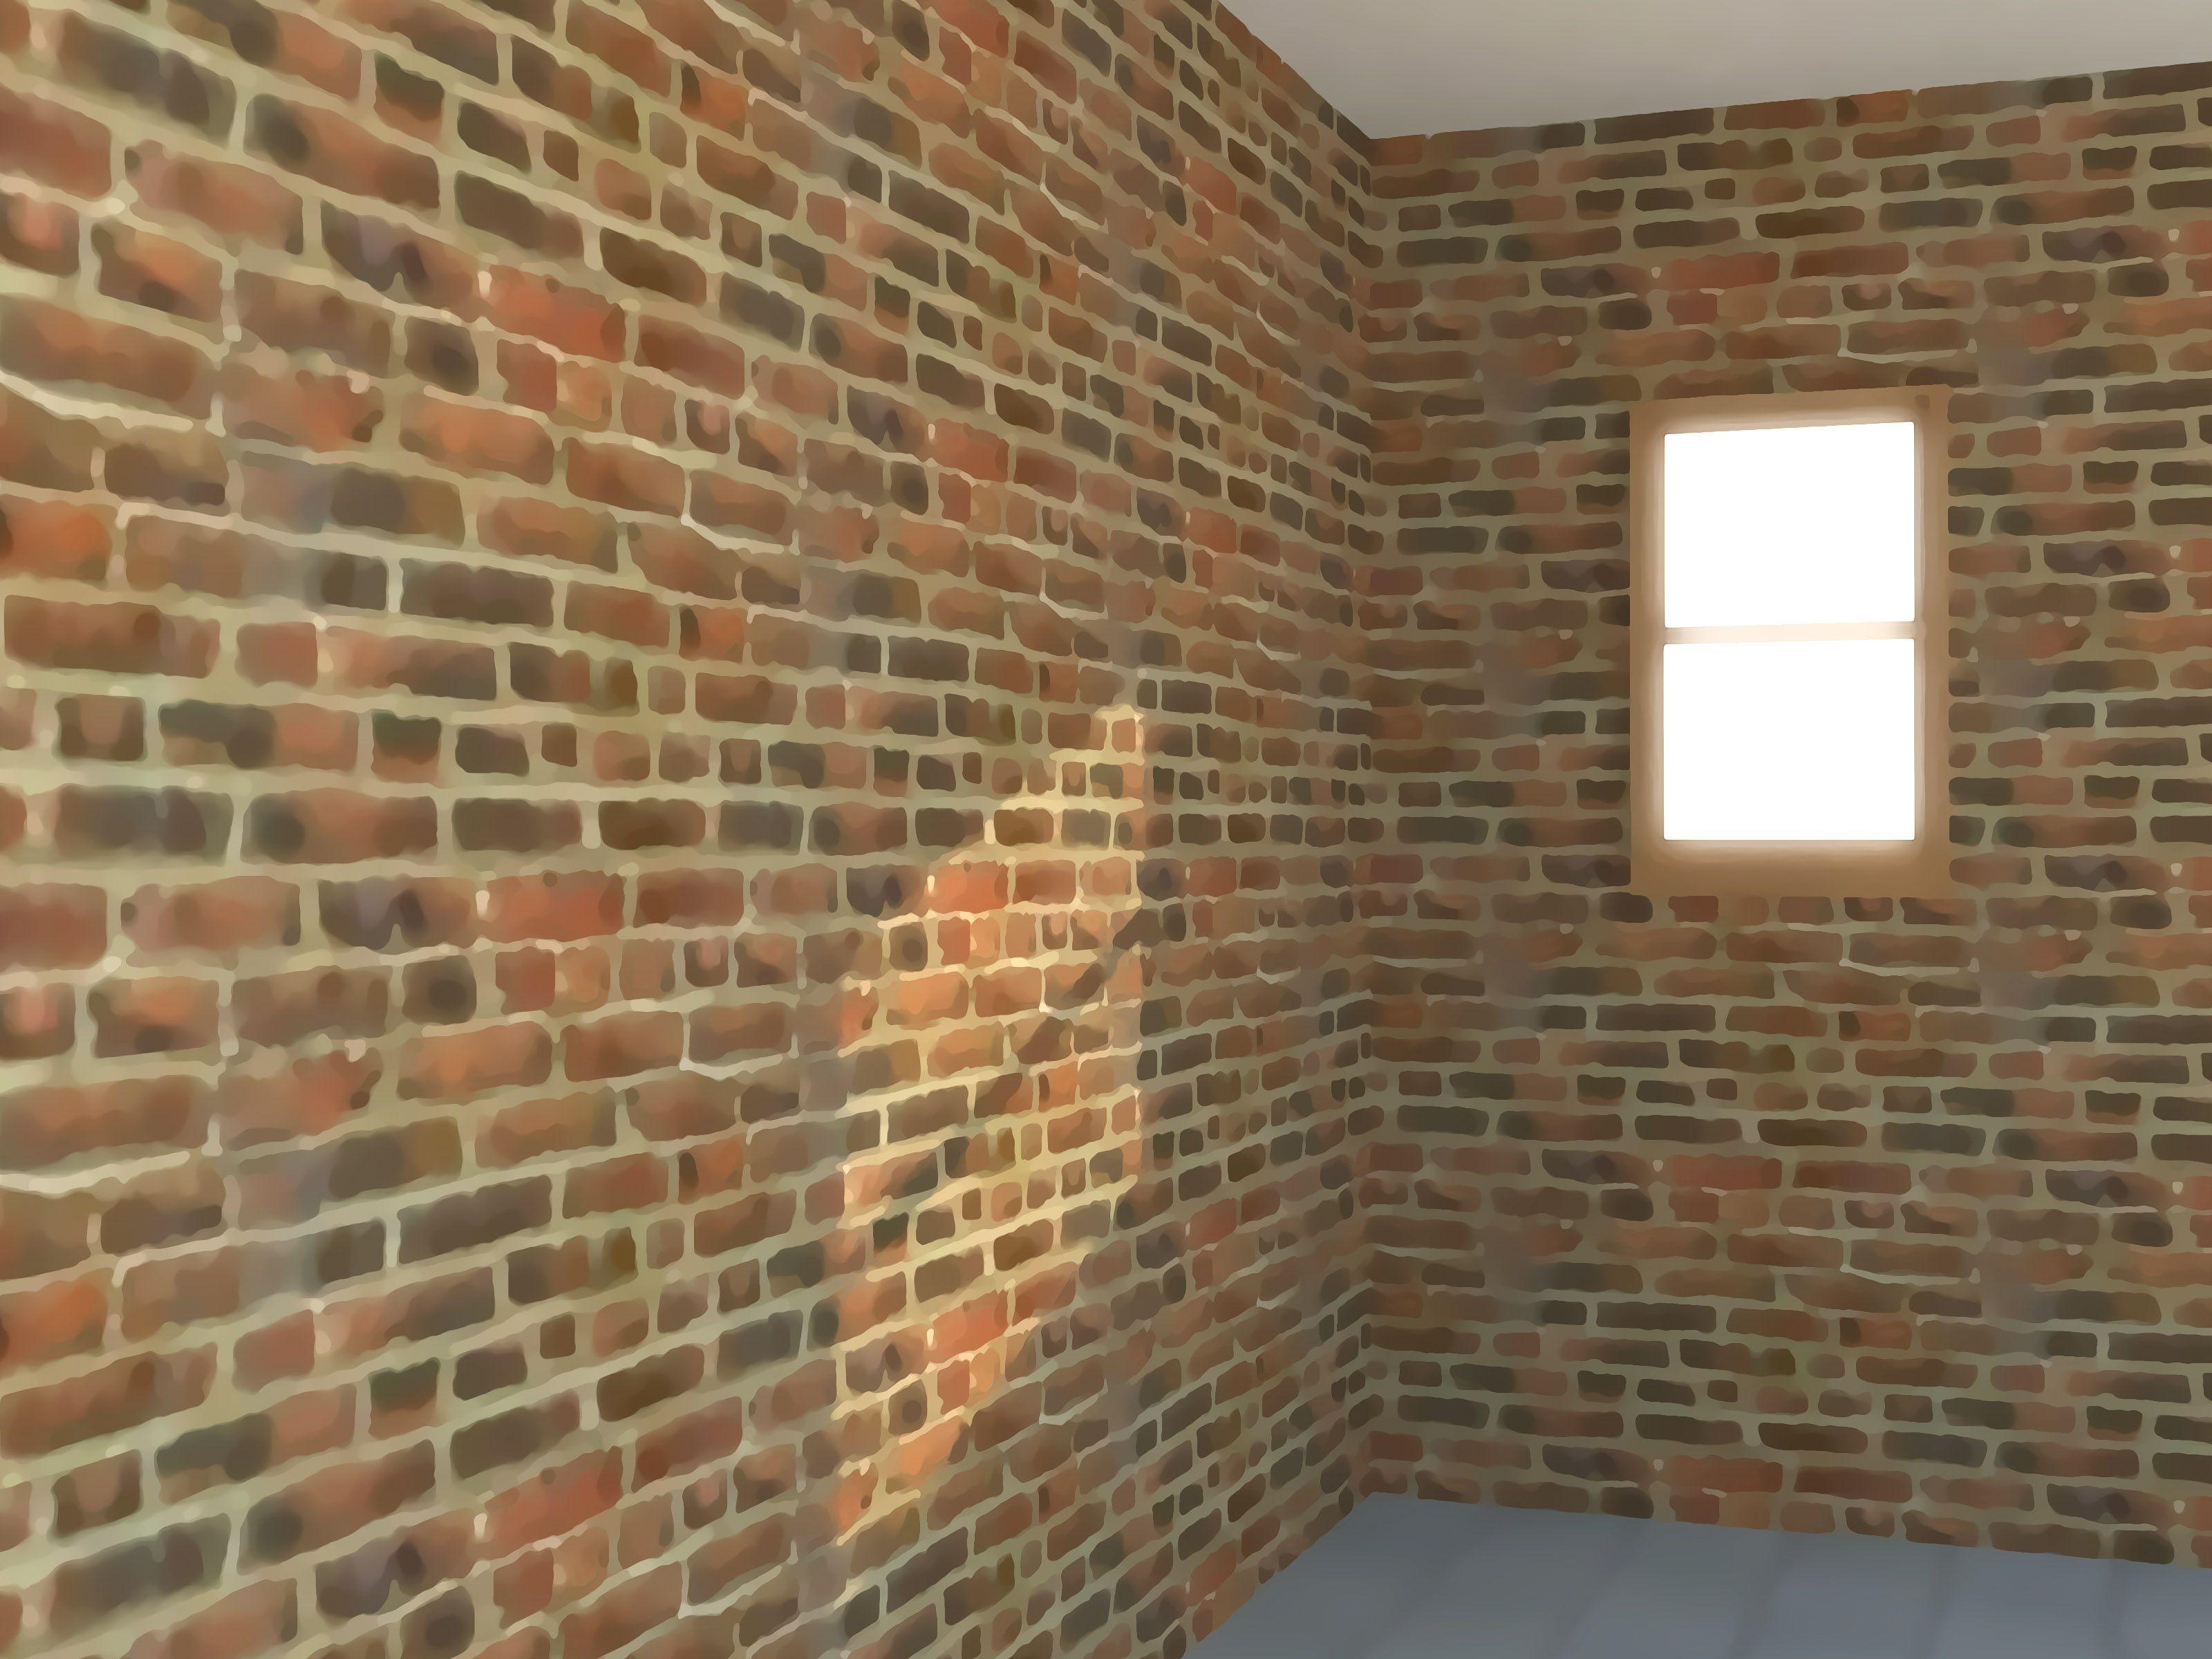 Exposed Brick, Exposed Brick Walls